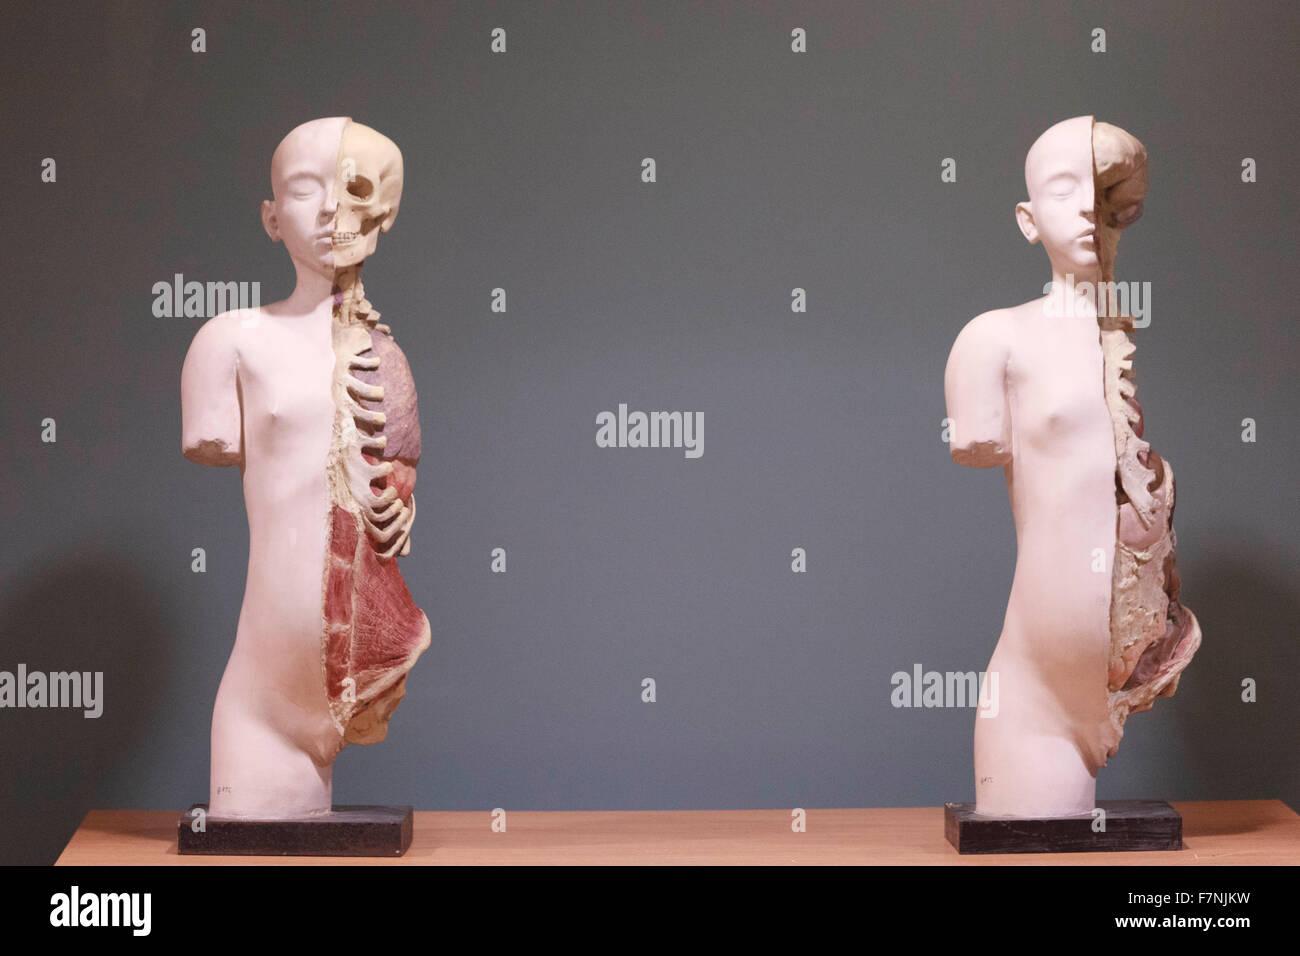 Edinburgh, UK. 2nd December. Anatomy exhibition highlights body's beauties inside and out. Edinburgh University - Stock Image